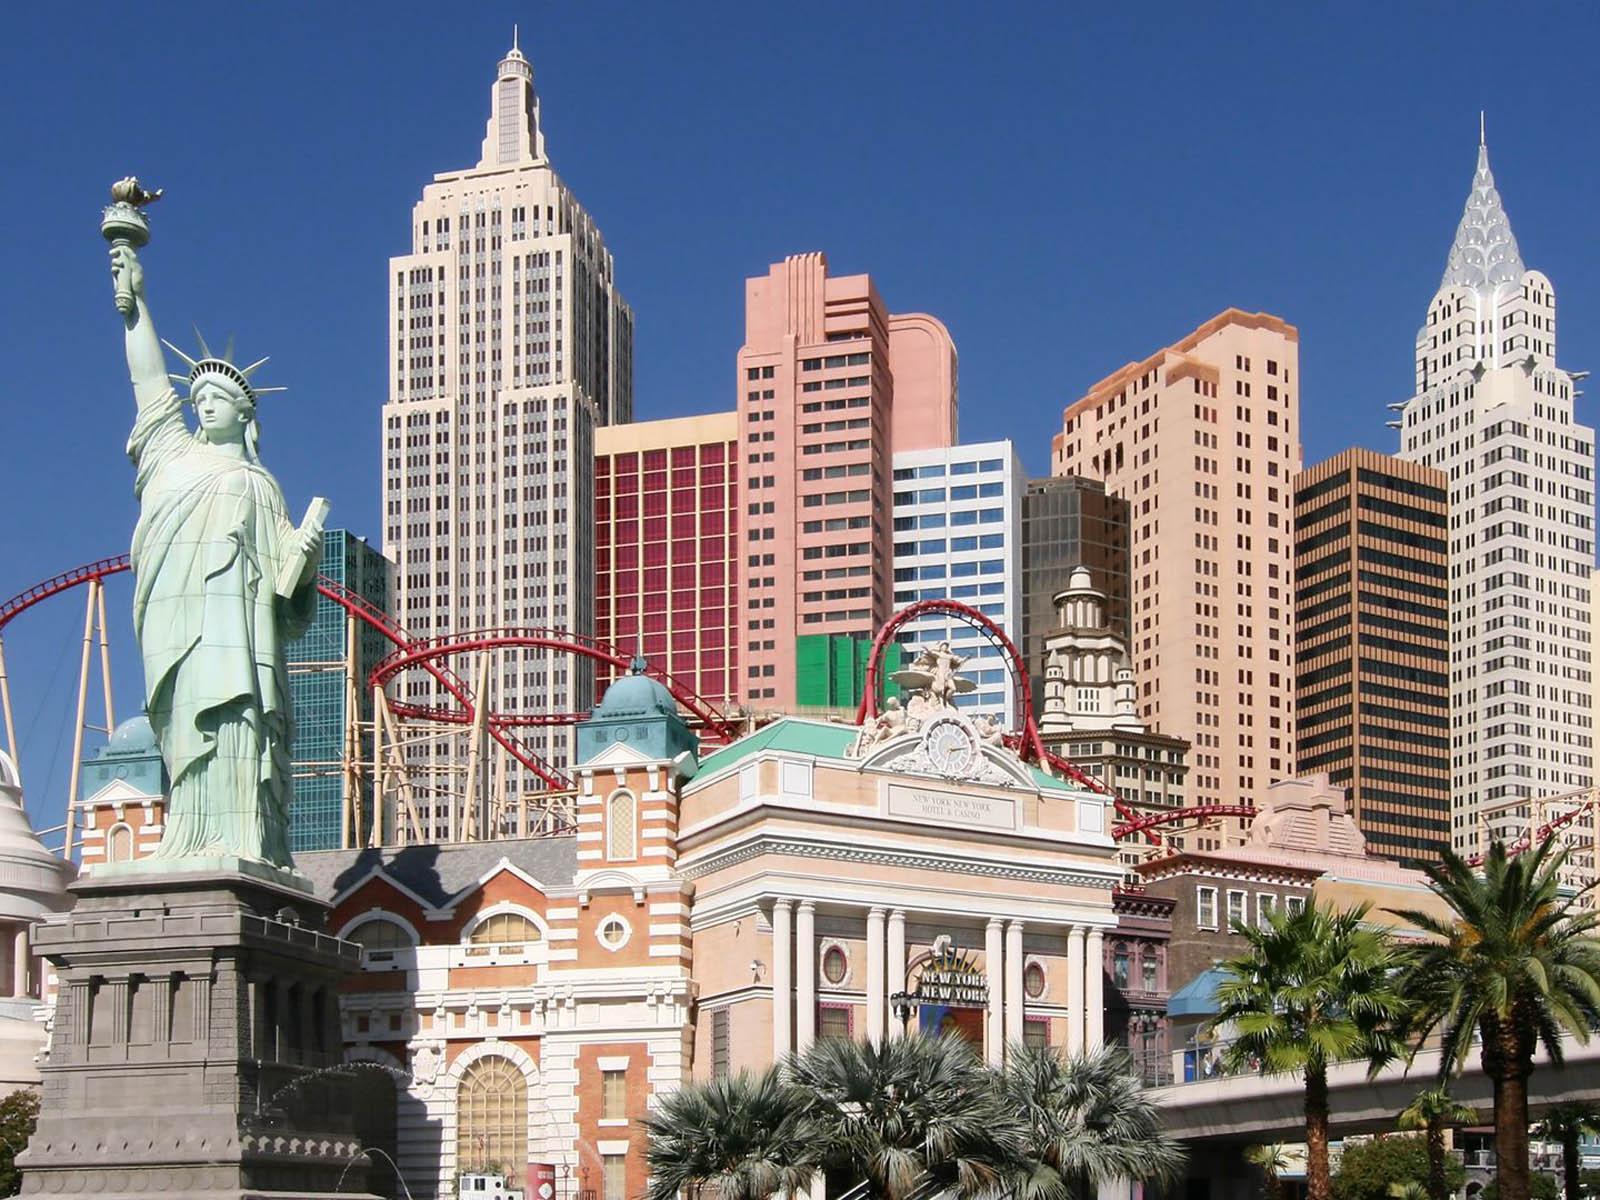 Bellagio Las Vegas Complejo tur stico, Nevada]